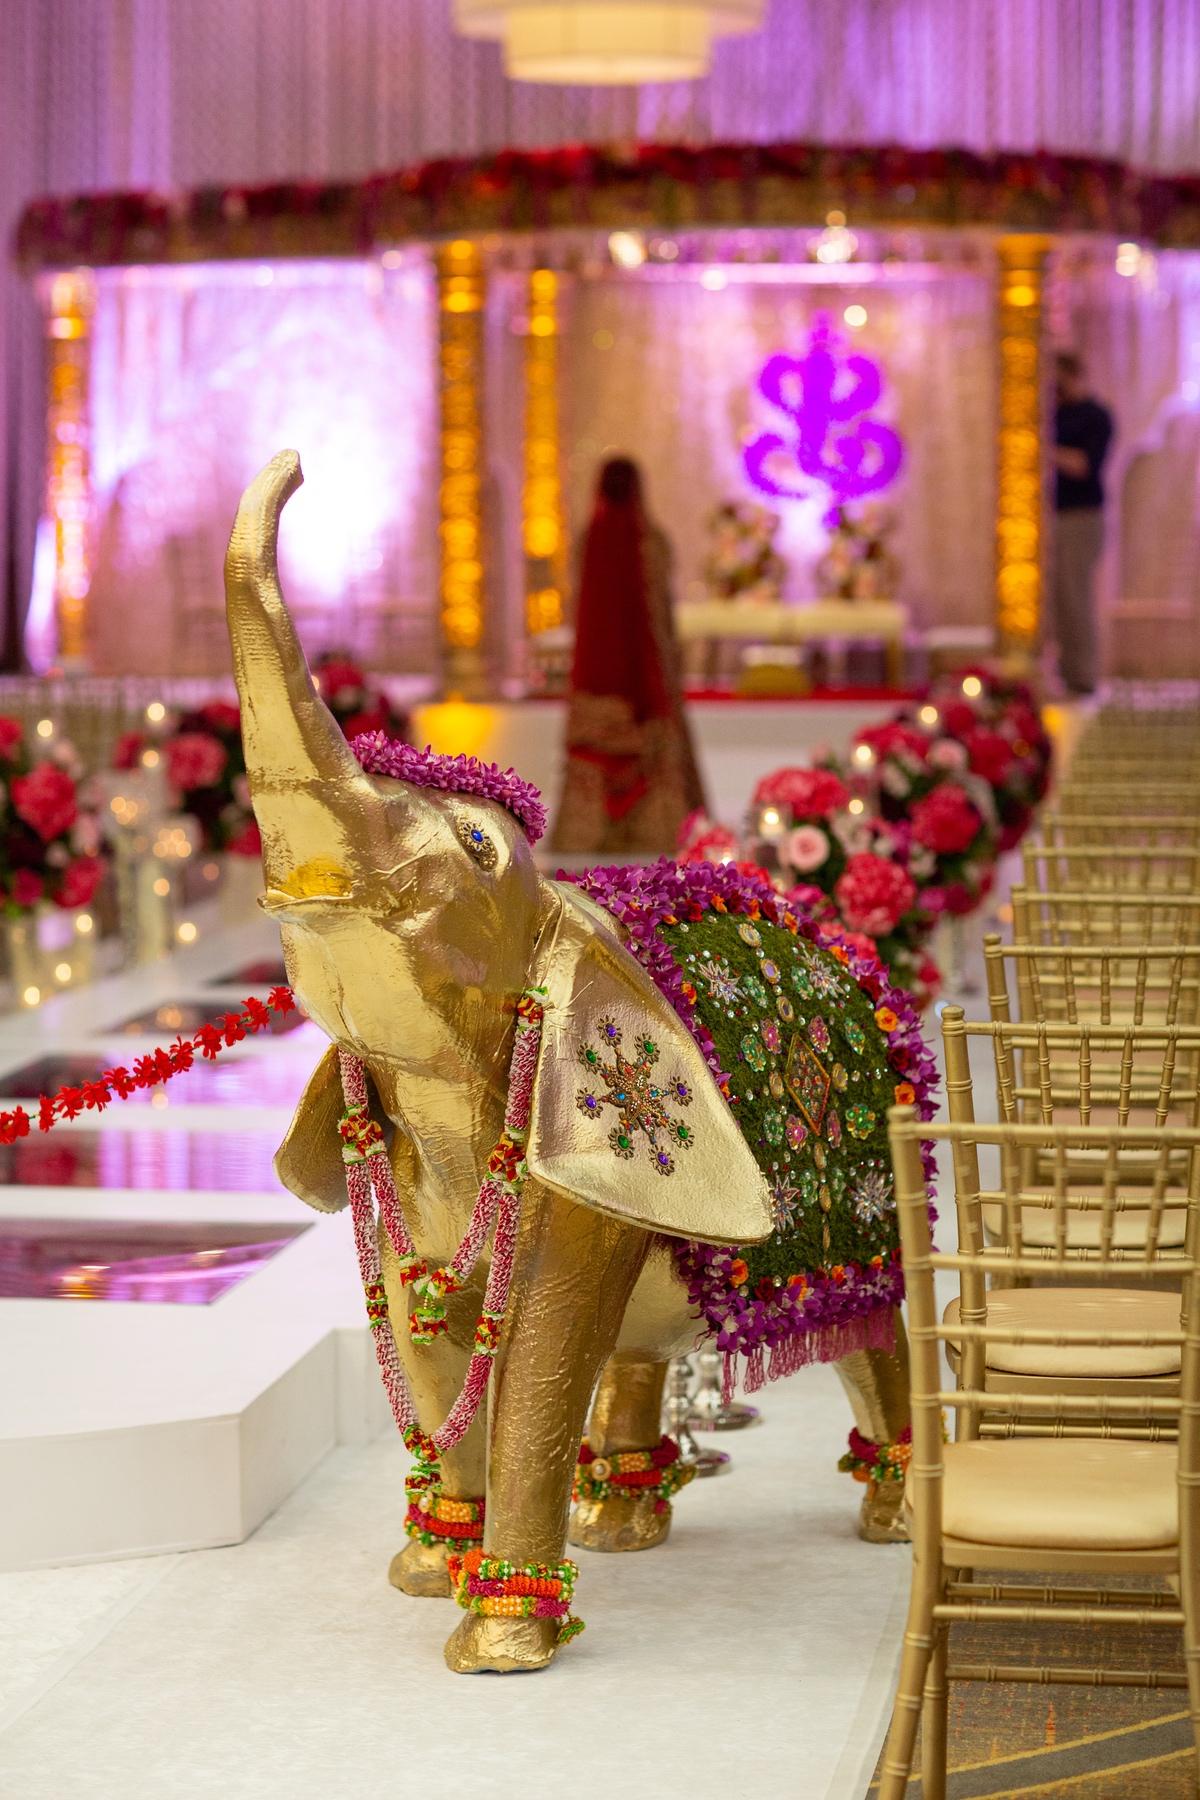 Le Cape Weddings - South Asian Wedding - Chicago Wedding Photographer P&V-38.jpg